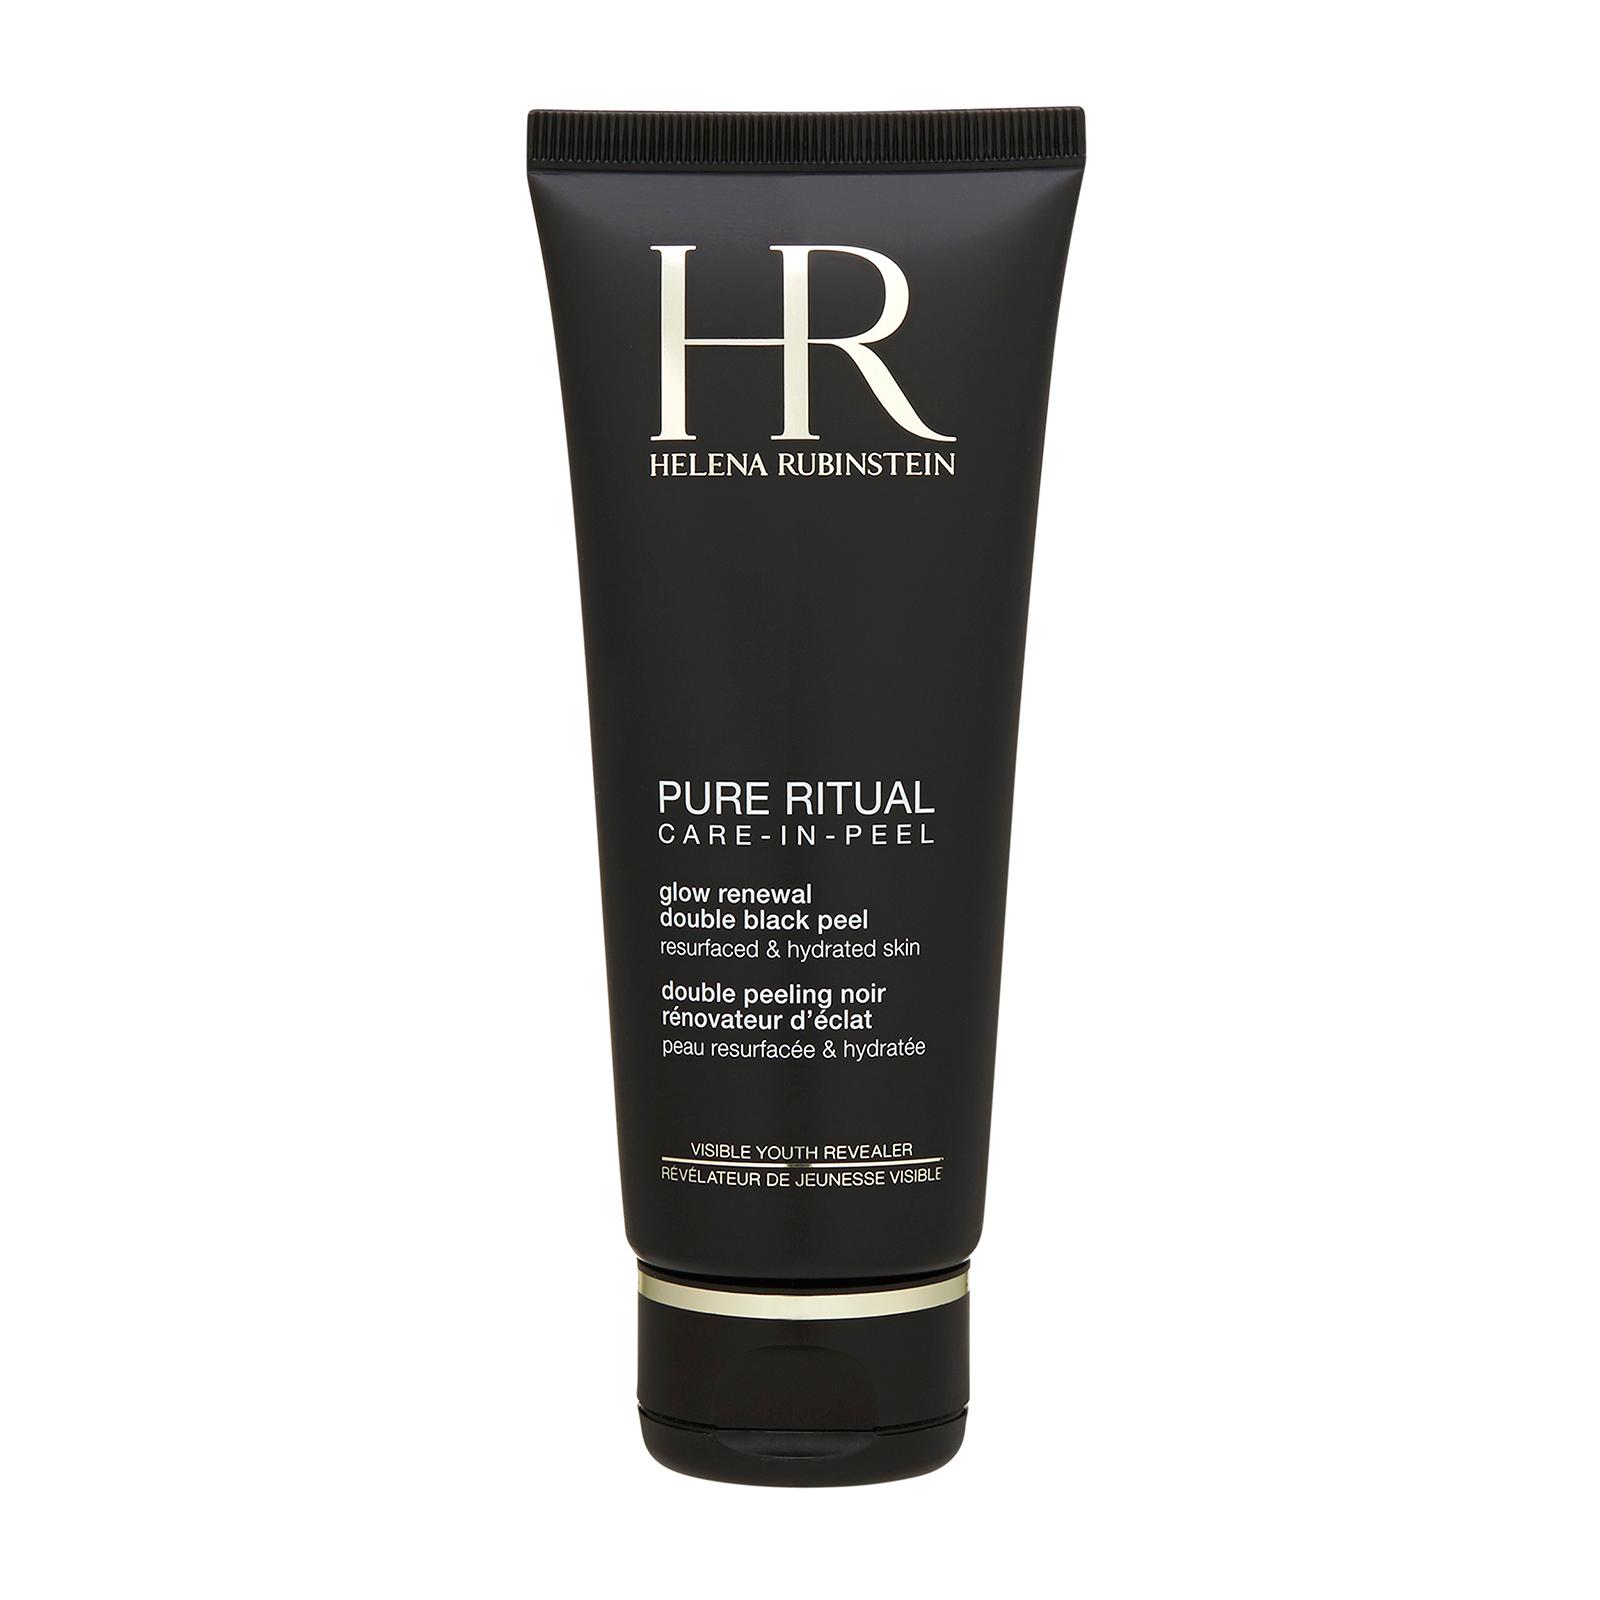 Helena Rubinstein Pure Ritual Care-In-Peel Glow Renewal Double Black Peel (For All Skin Types) 3.38oz, 100ml from Cosme-De.com